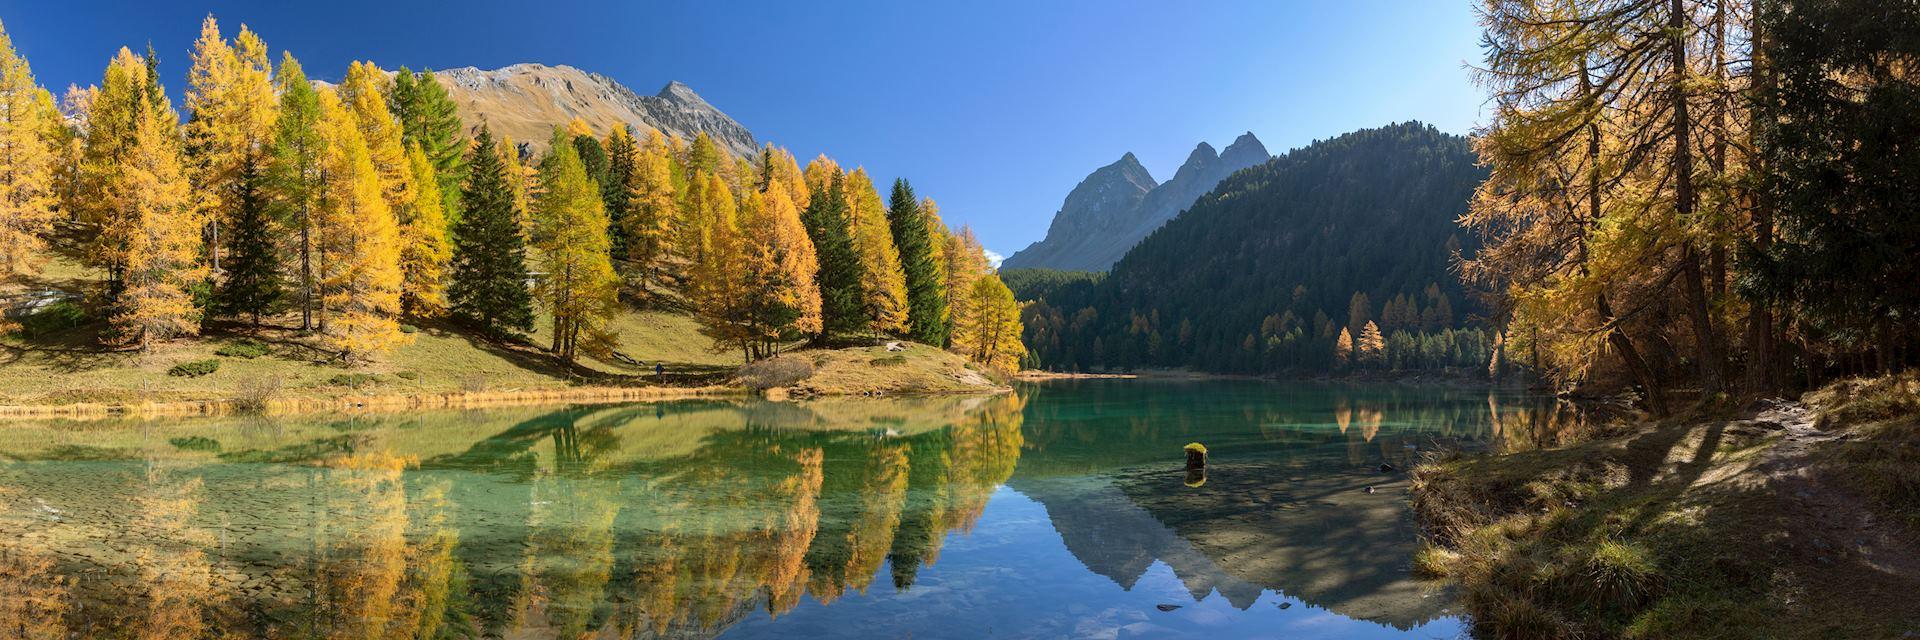 Lake Palpuogna, Switzerland